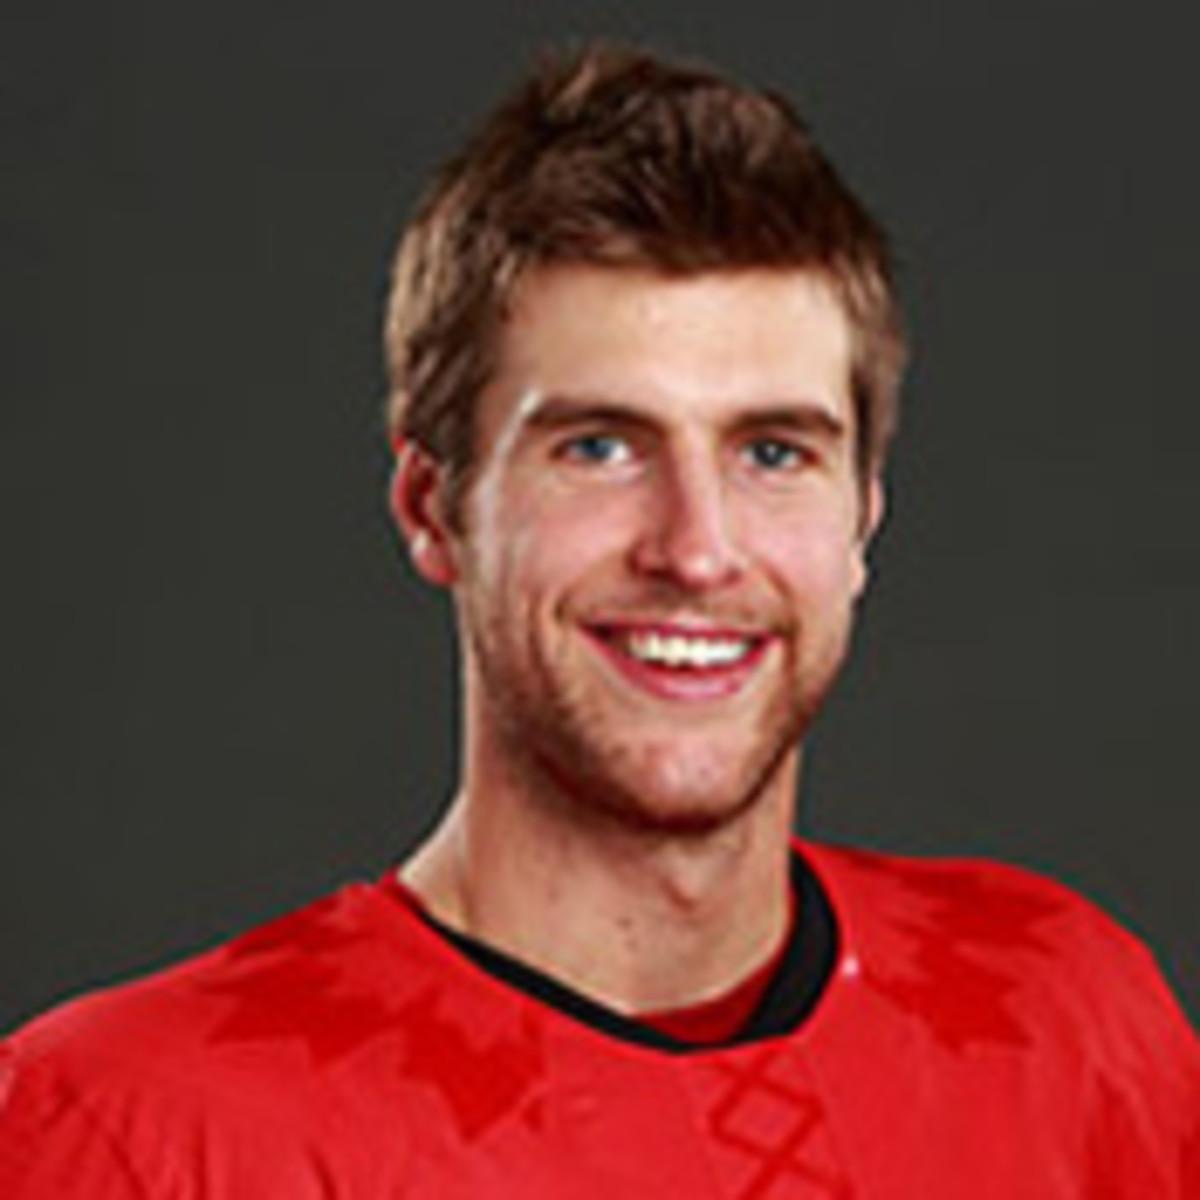 alex pietrangelo 2014 canada men's olympic hockey